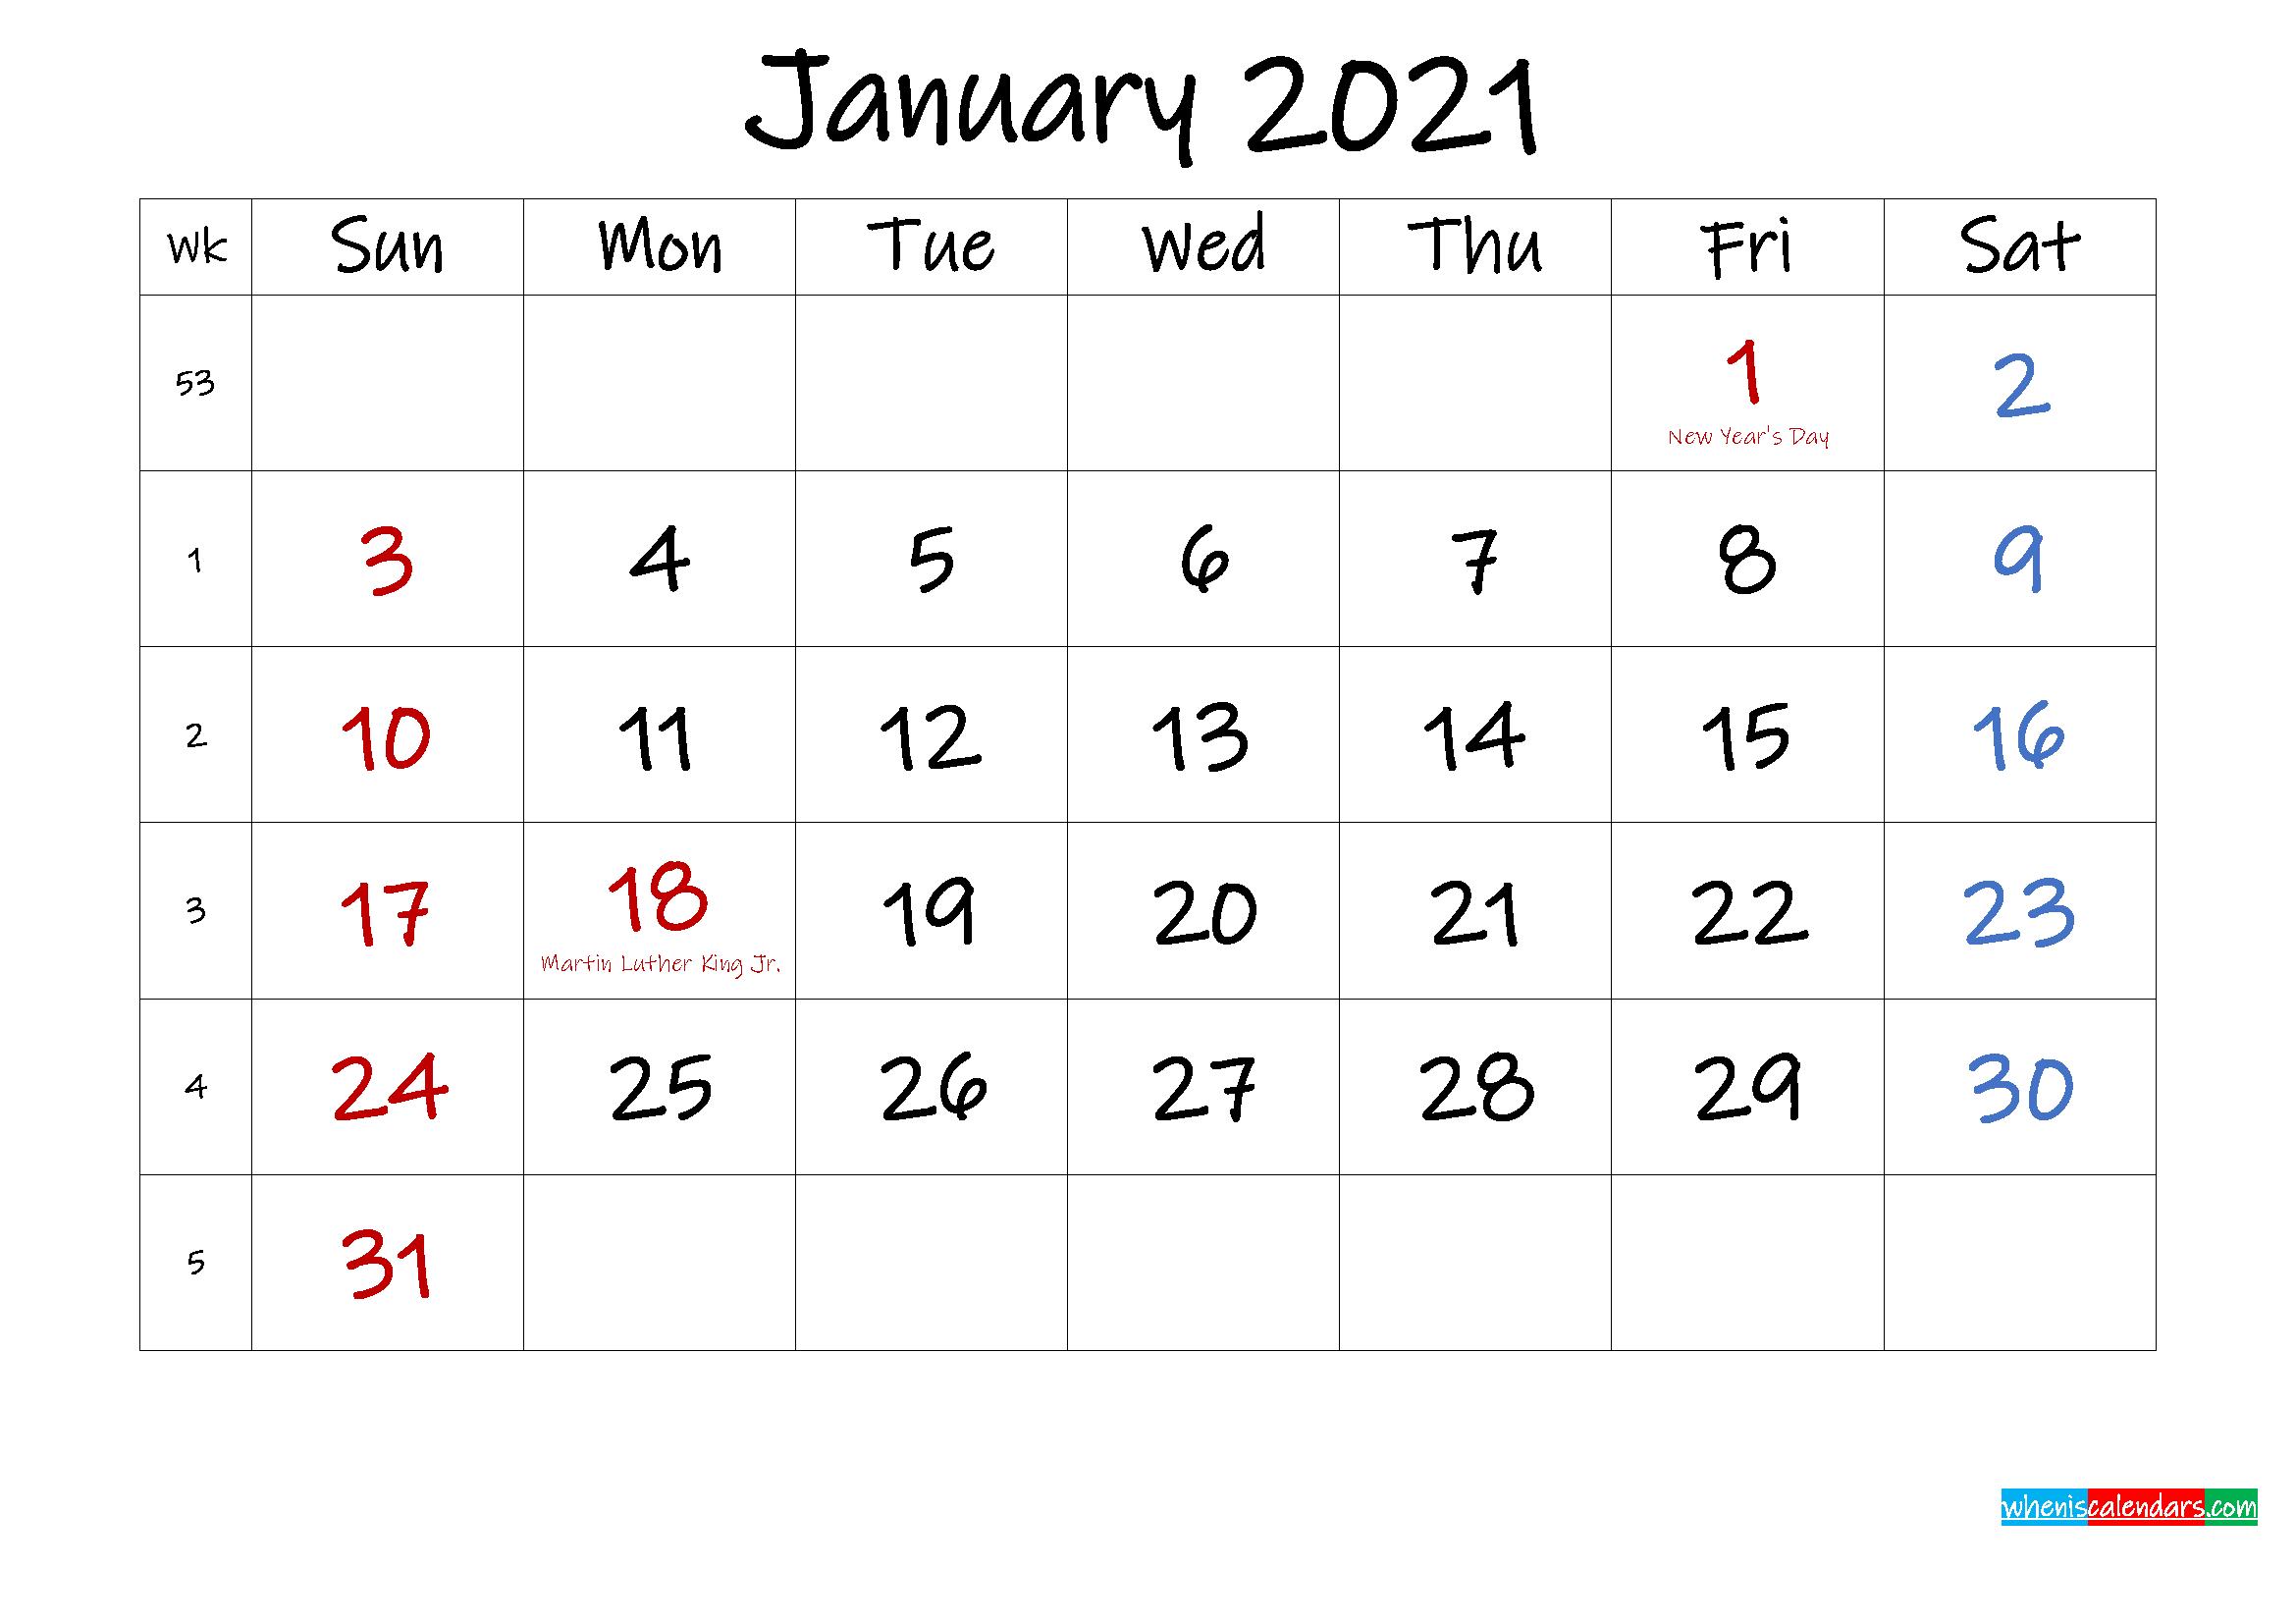 January 2021 Free Printable Calendar with Holidays ...